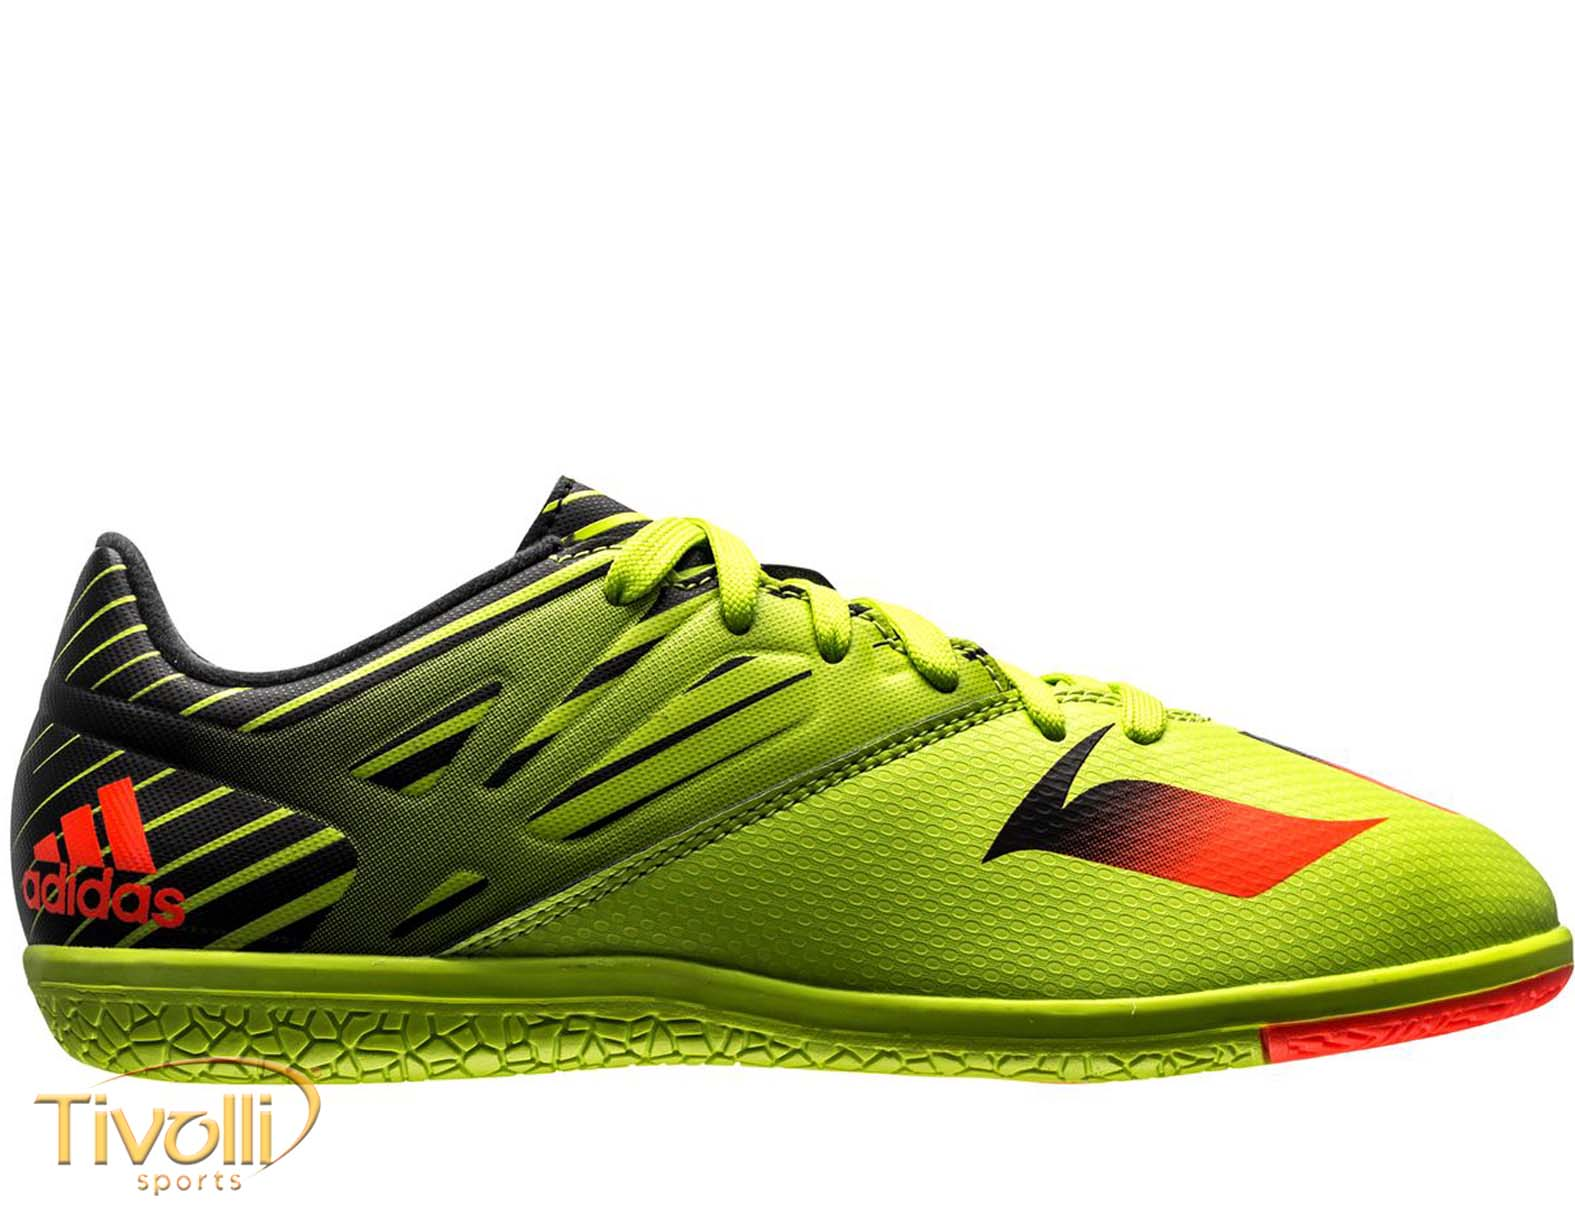 17fcf68b4d Chuteira Adidas Messi 15.3 Futsal infantil   - Mega Saldão